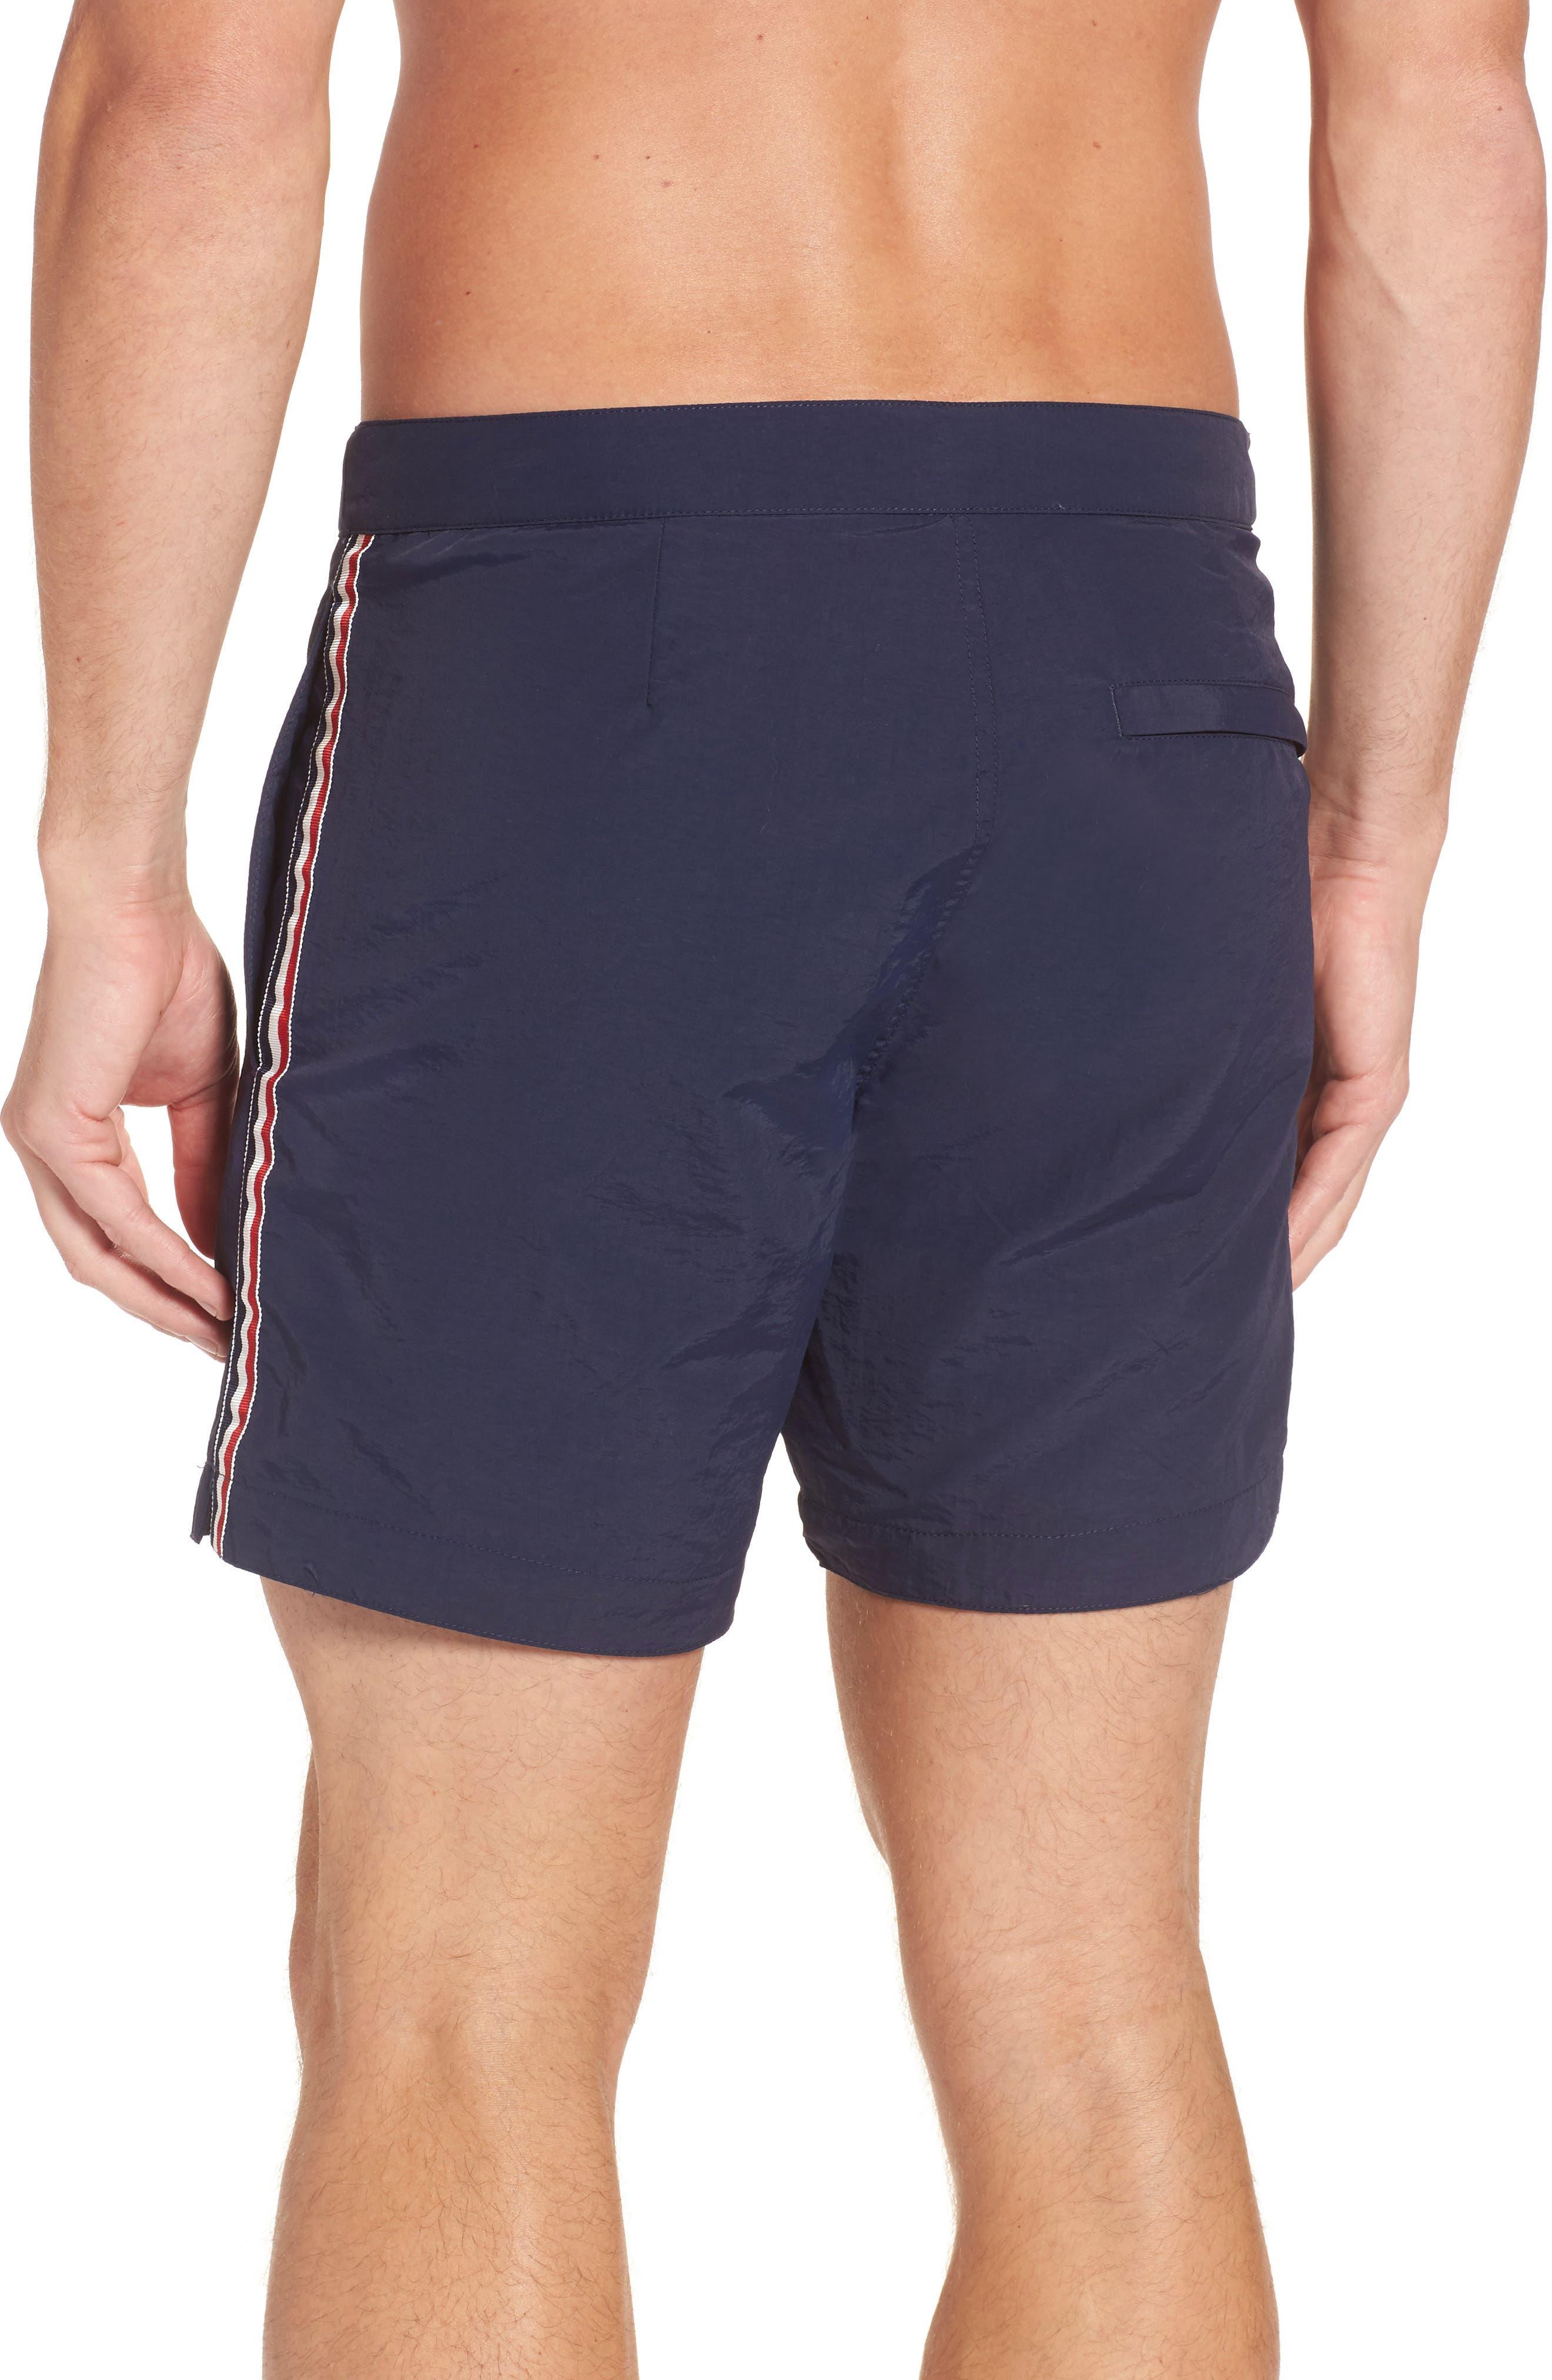 Aruba Tailored Fit French Stripe Swim Trunks,                             Alternate thumbnail 2, color,                             Navy French Stripes